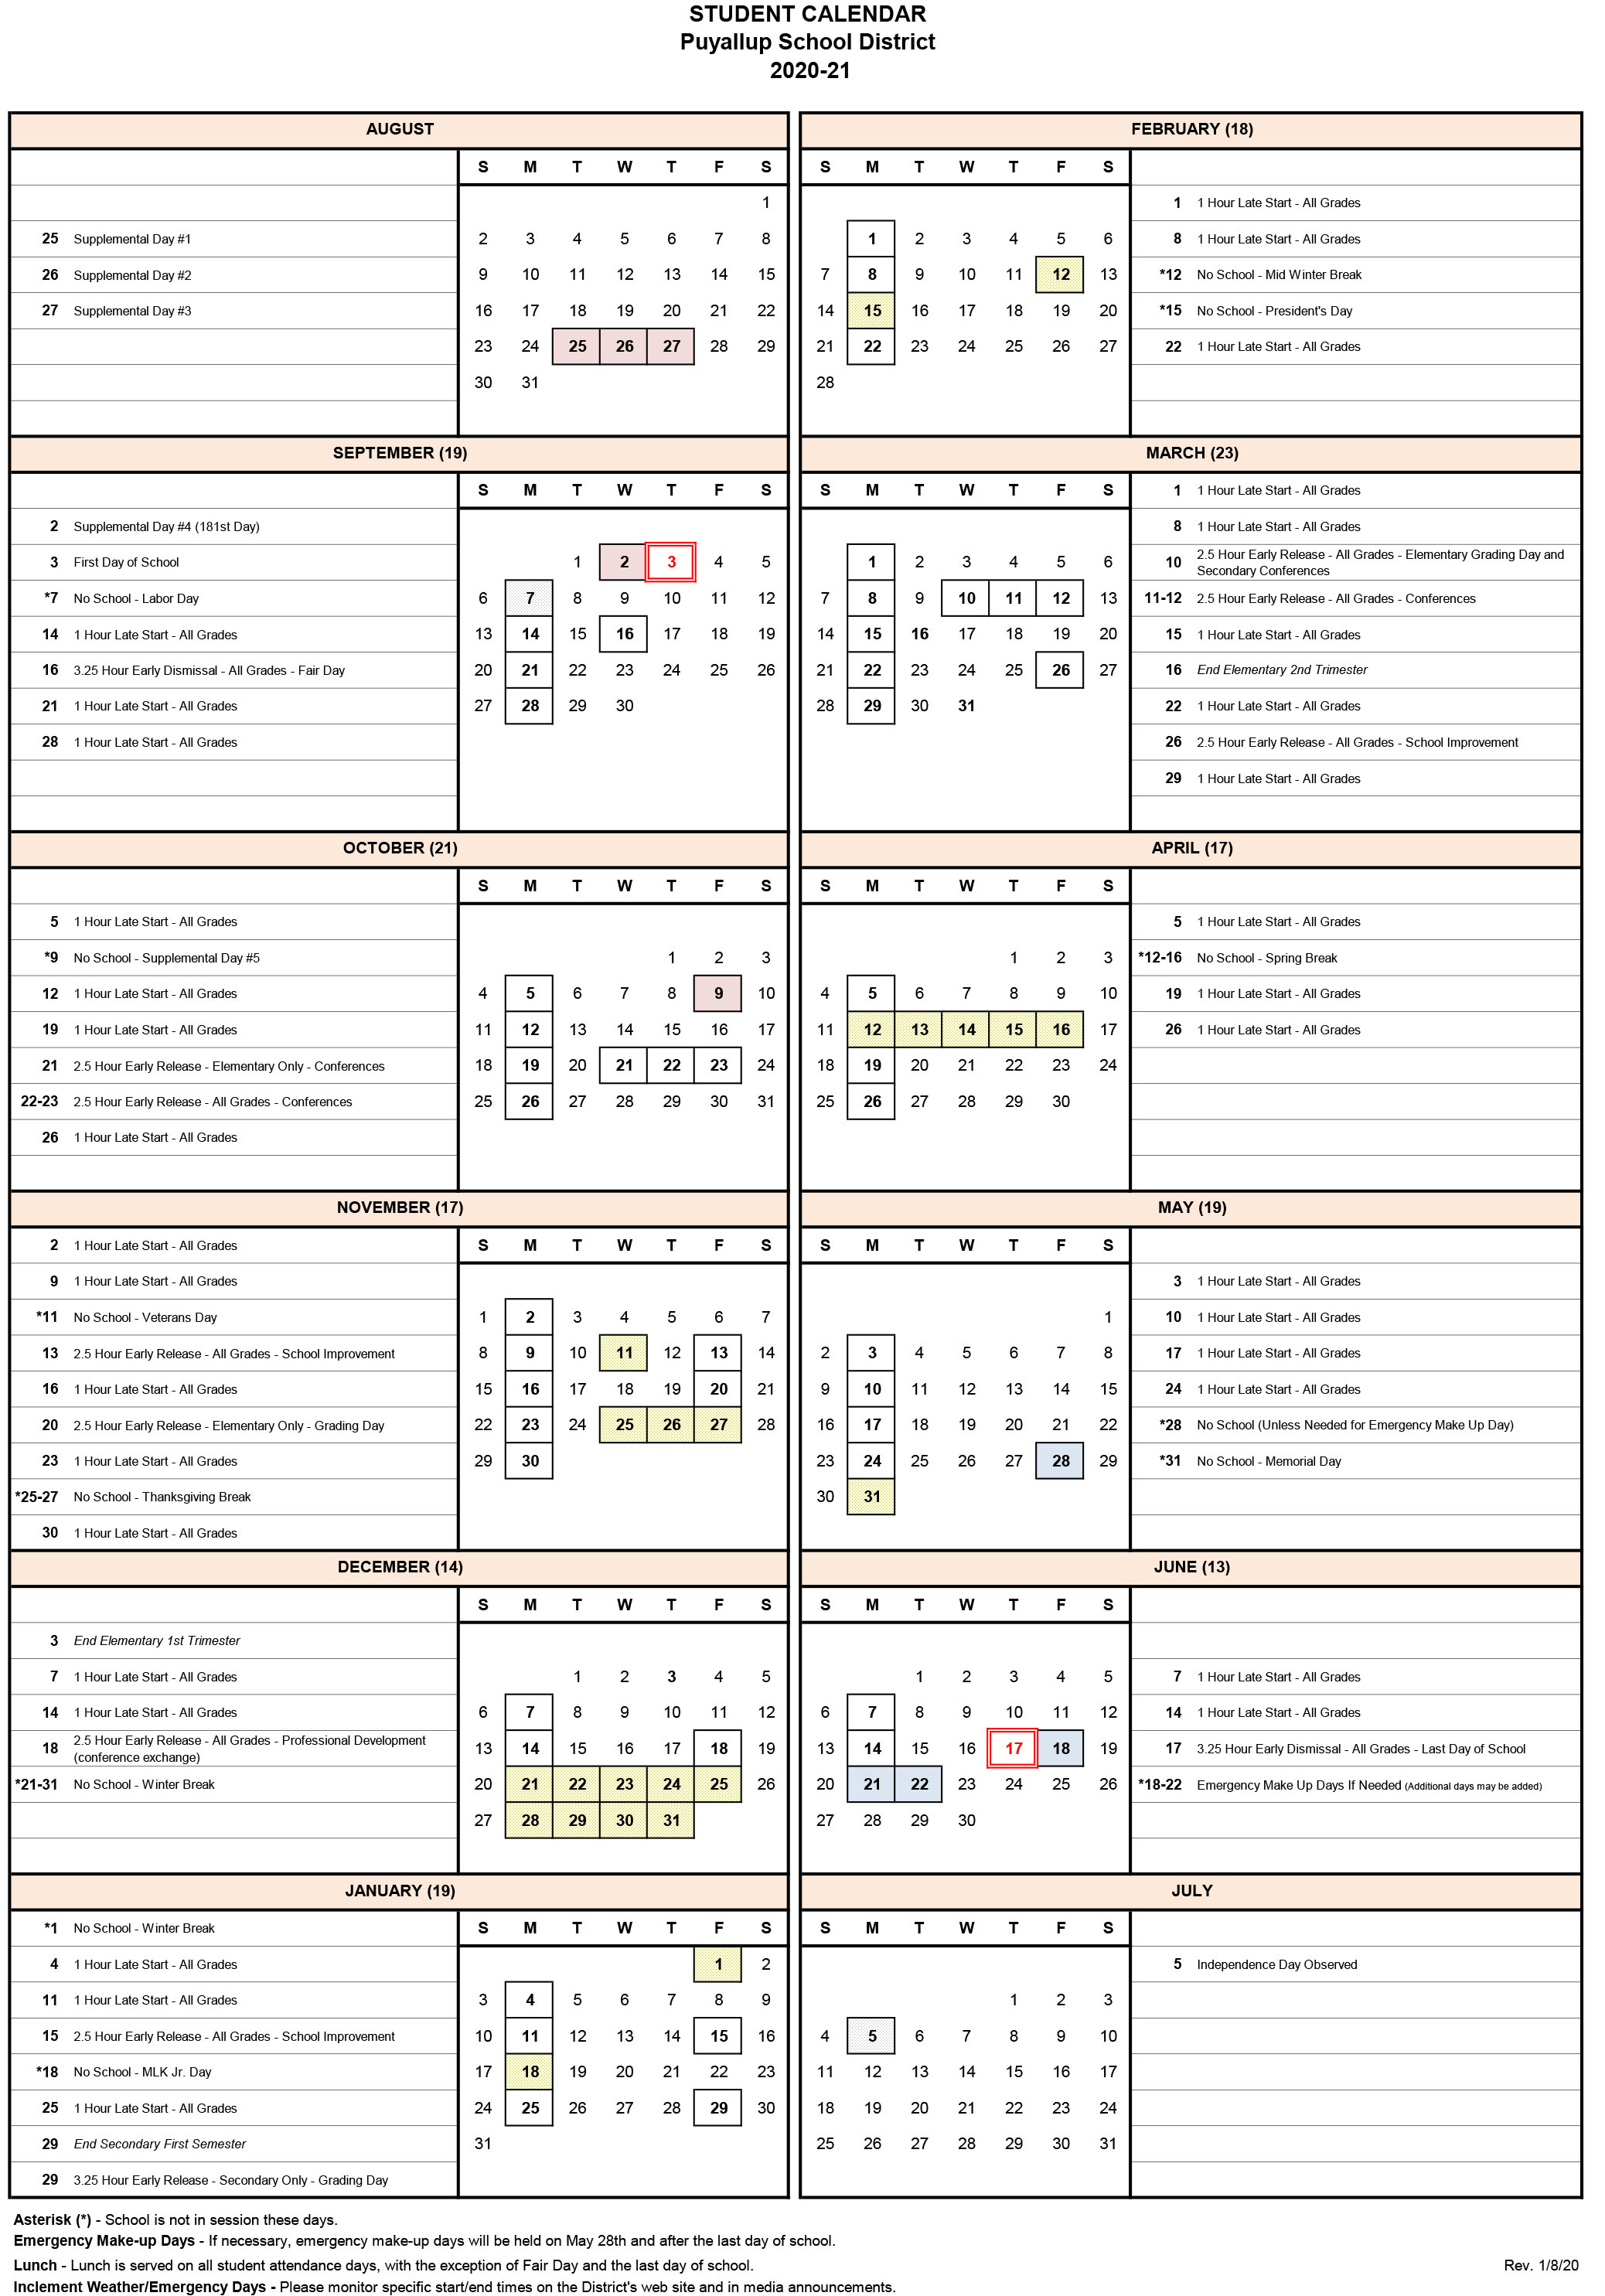 2020 2021 Student Calendar Approved - Puyallup School District Inside Golden West College Winter Break Schedule 2021